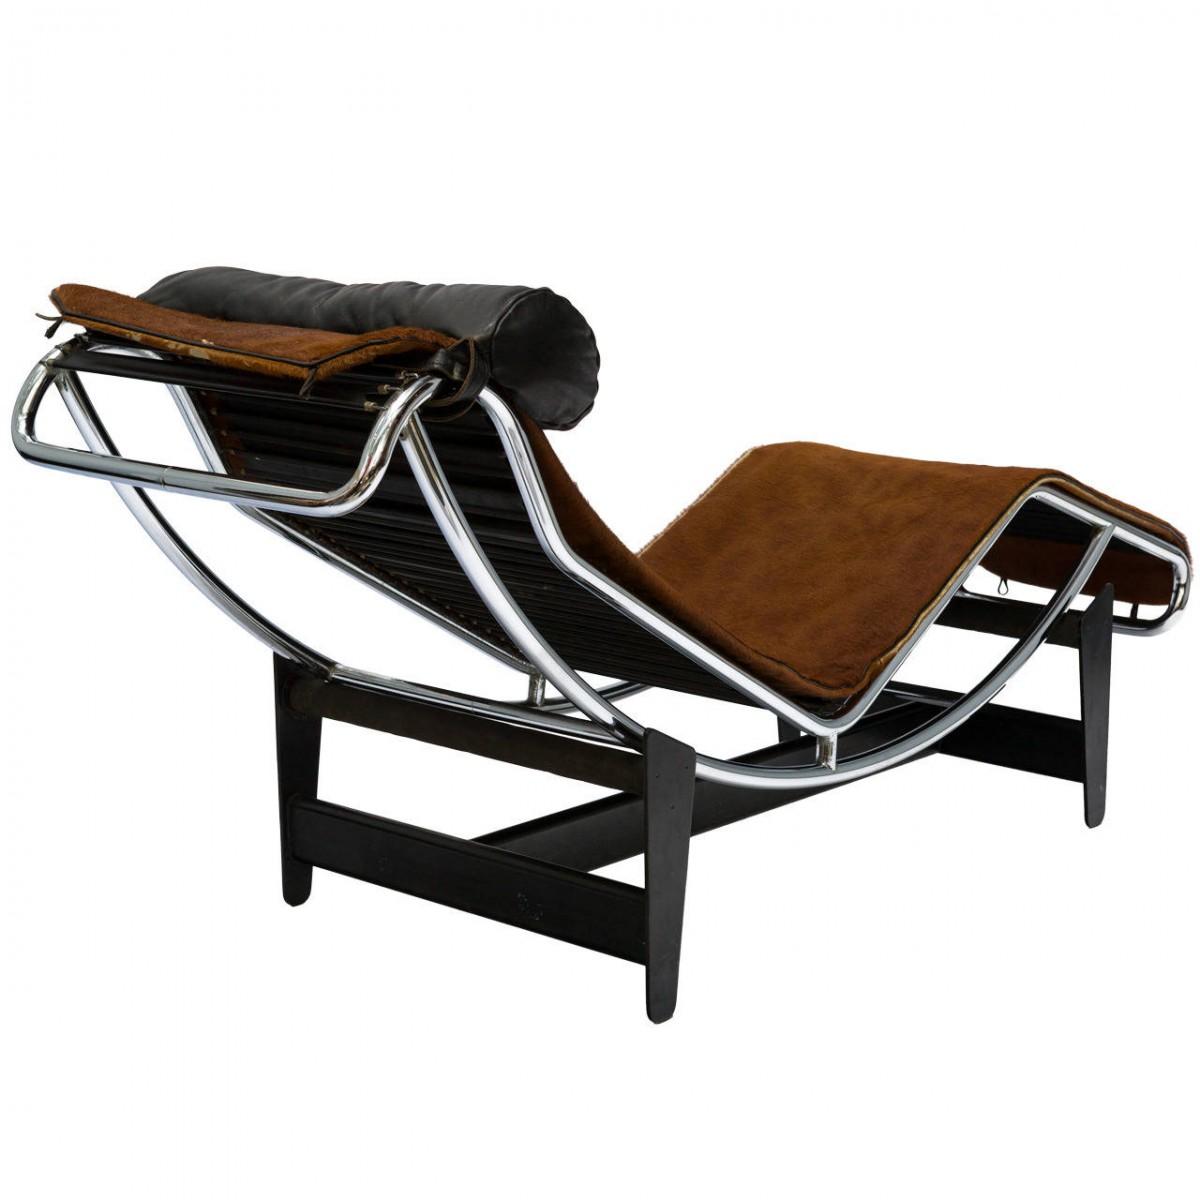 spark interior products. Black Bedroom Furniture Sets. Home Design Ideas